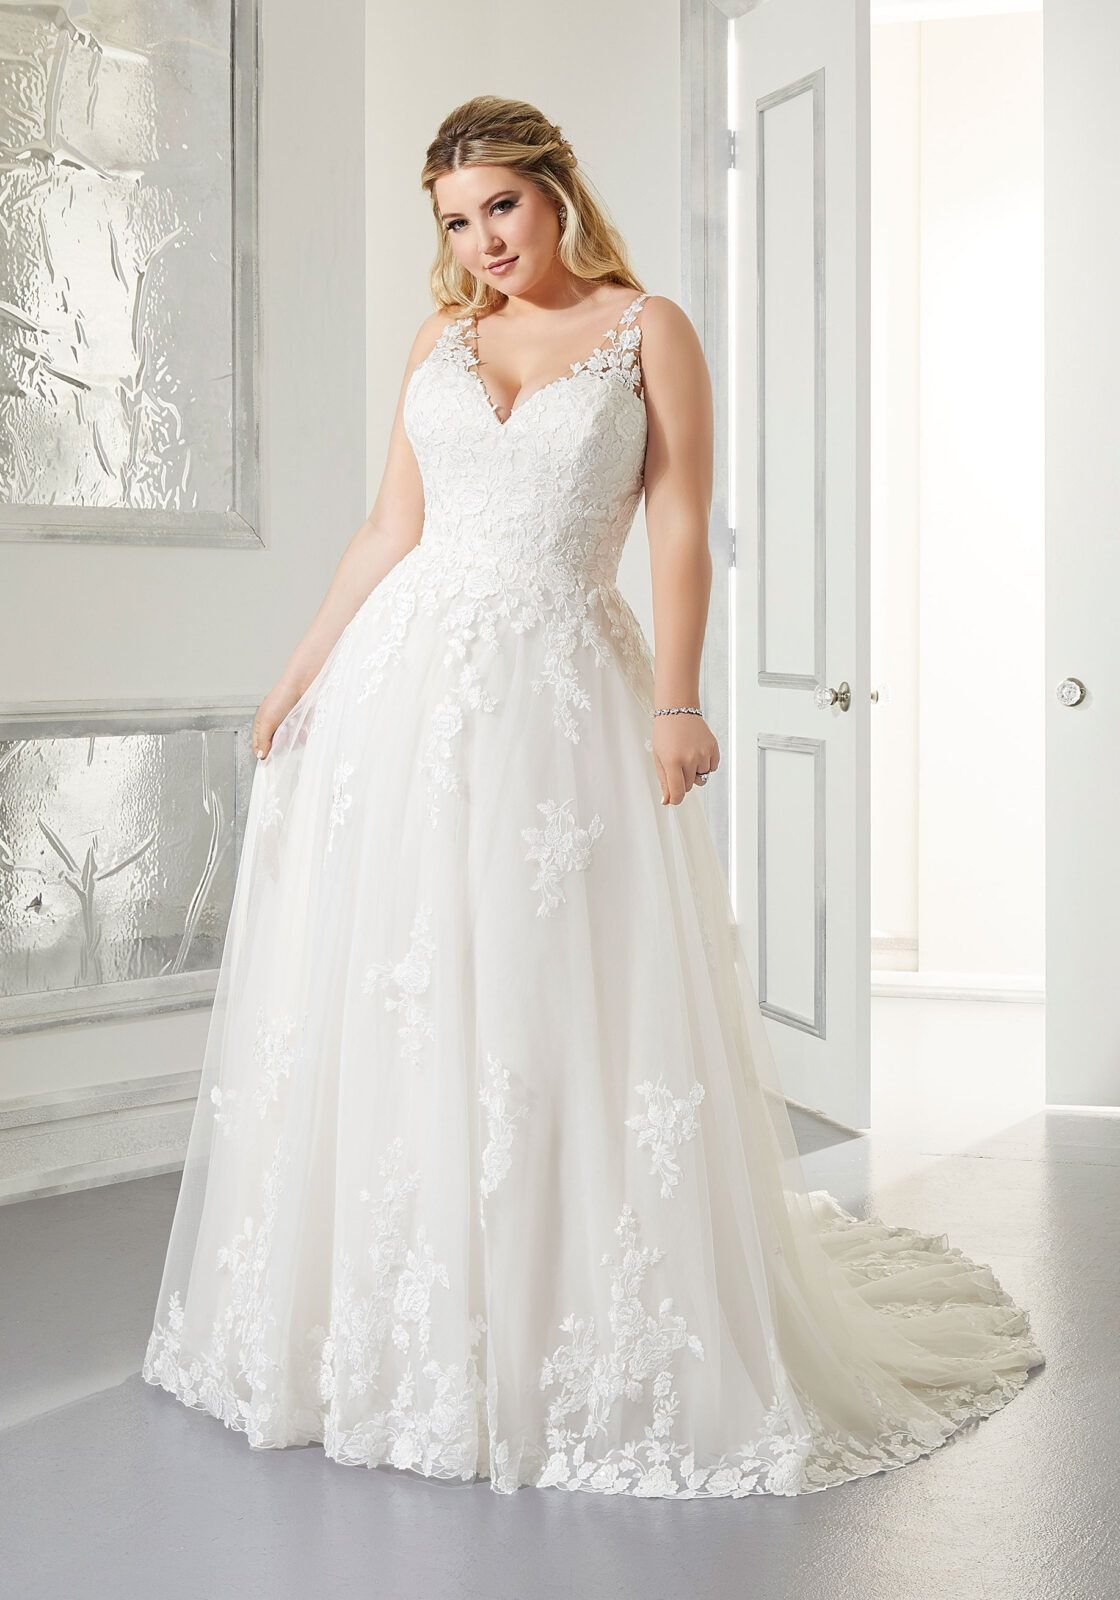 Arlene Wedding Dress Morilee Wedding Dresses Plus Size Wedding Dresses Julietta Wedding Dress [ 1600 x 1120 Pixel ]